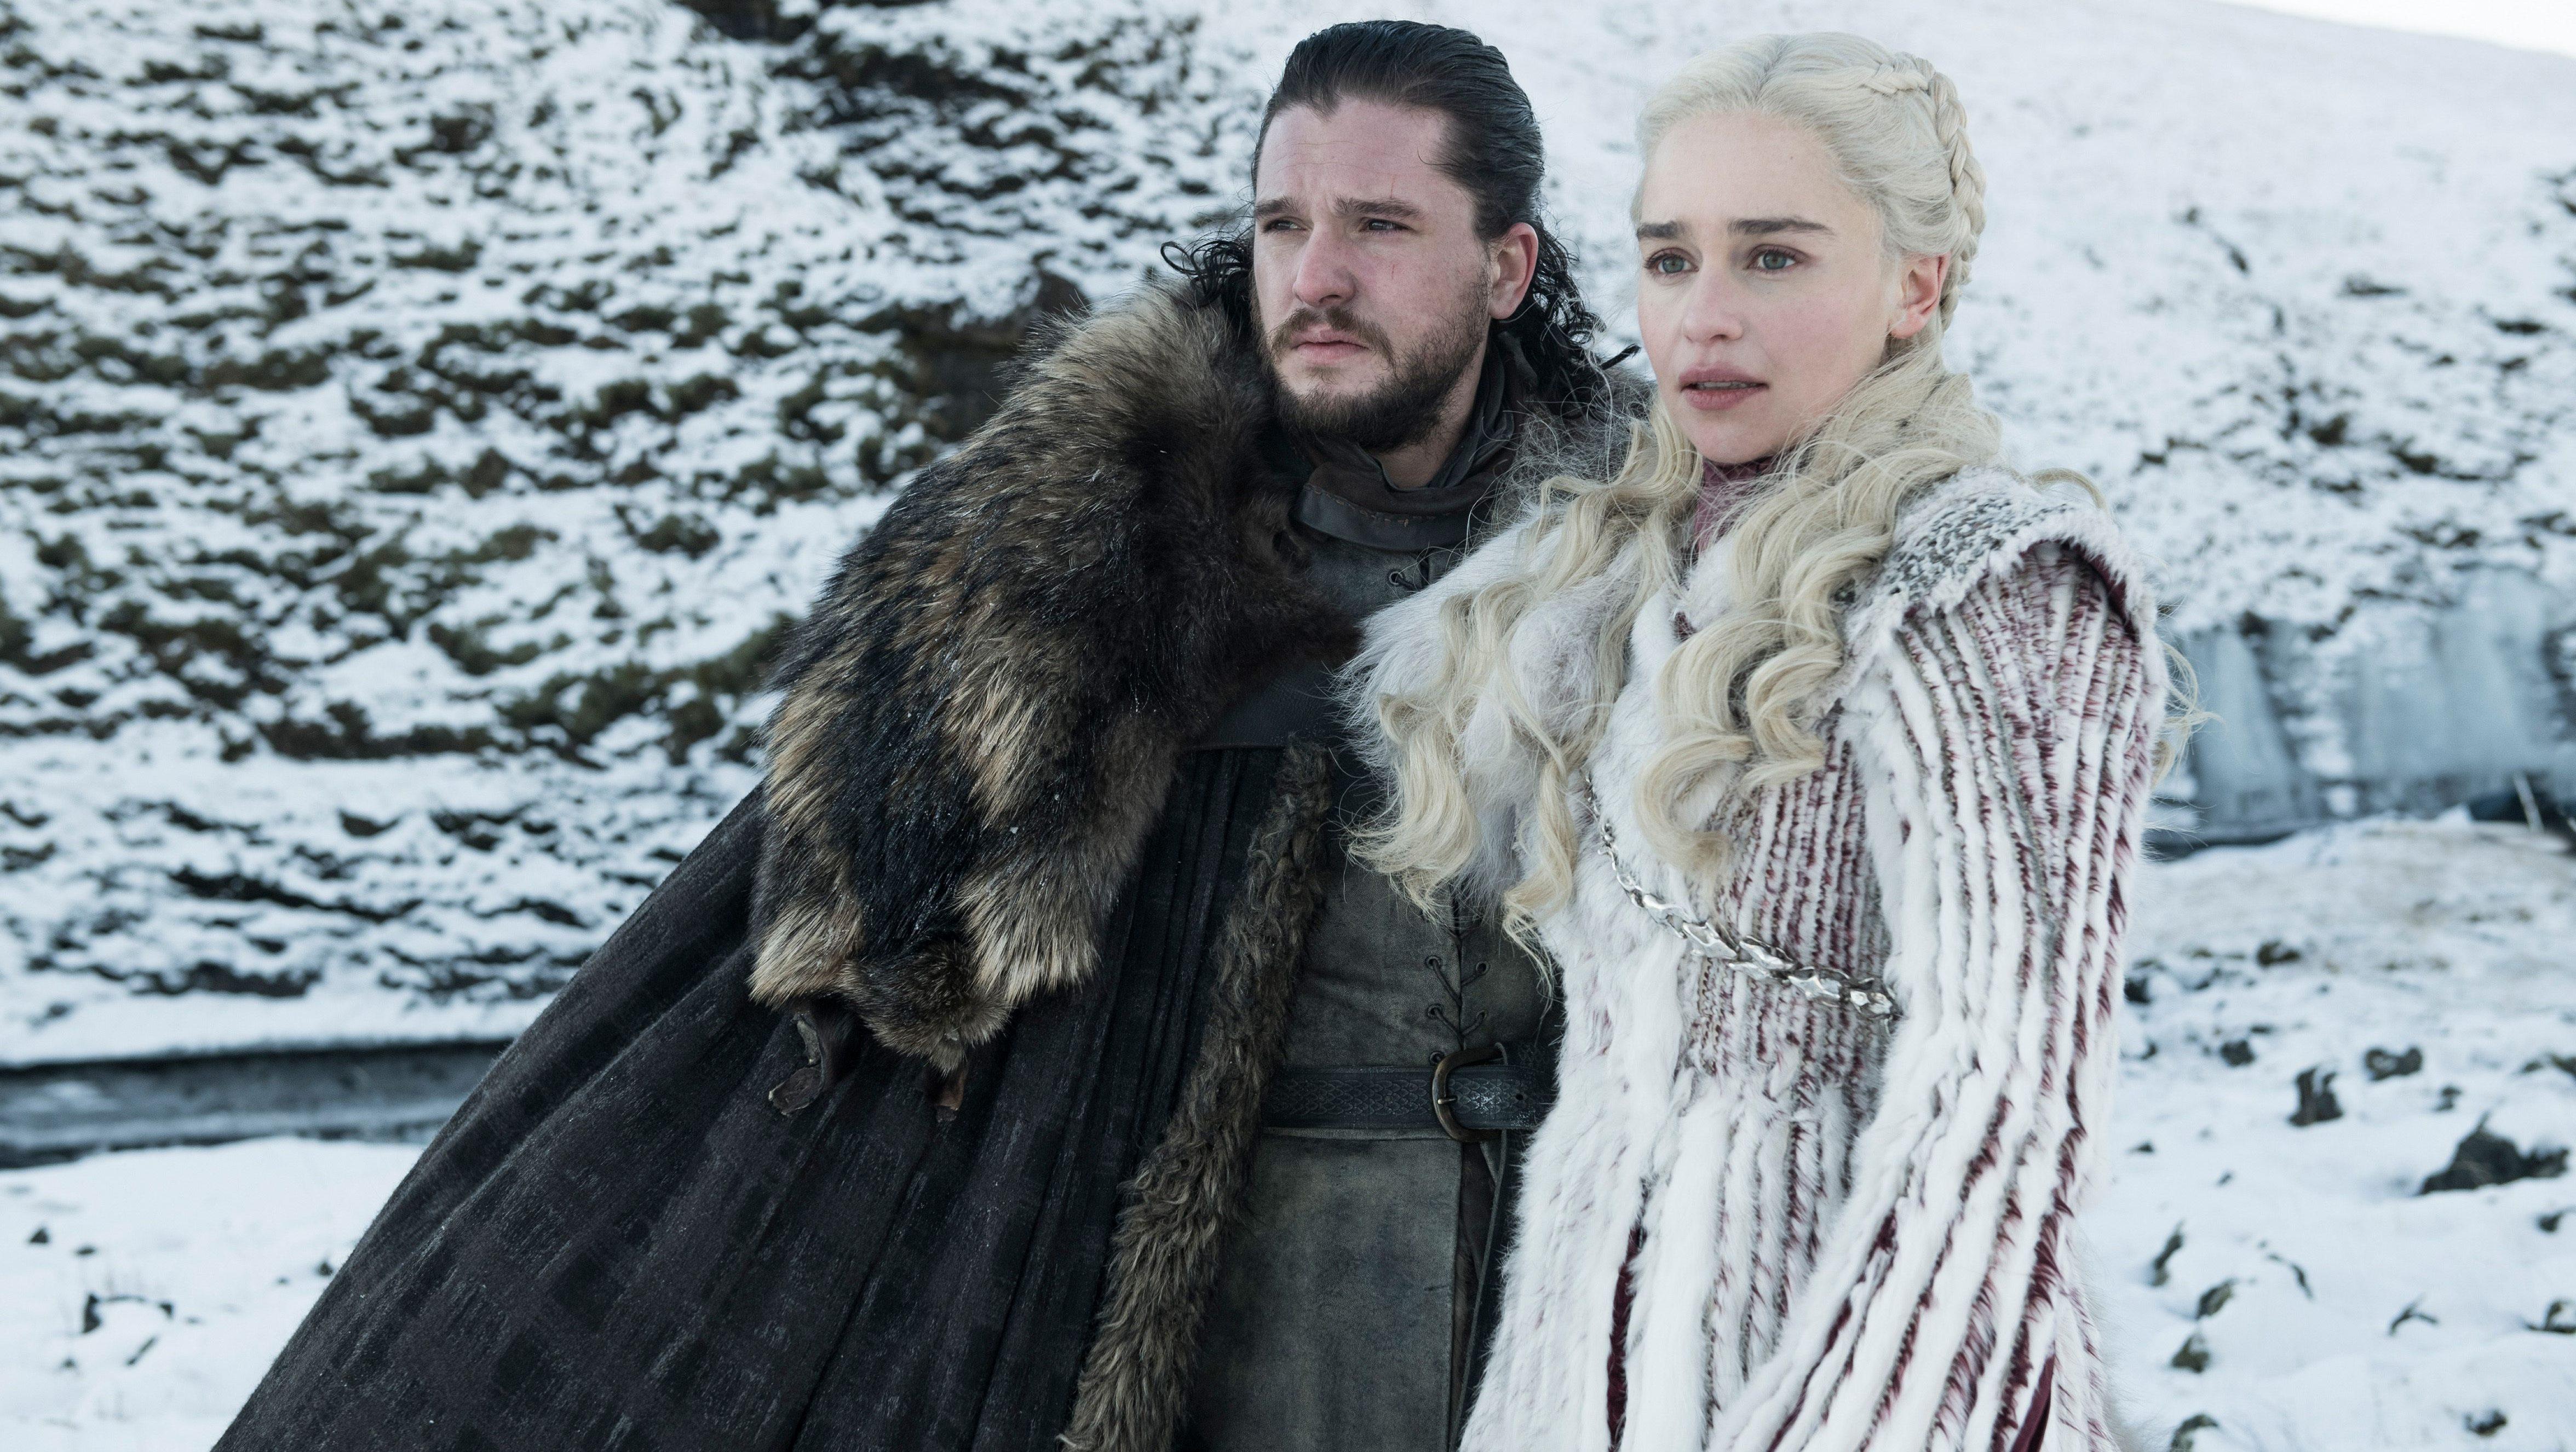 hbo daenerys jon snow game of thrones